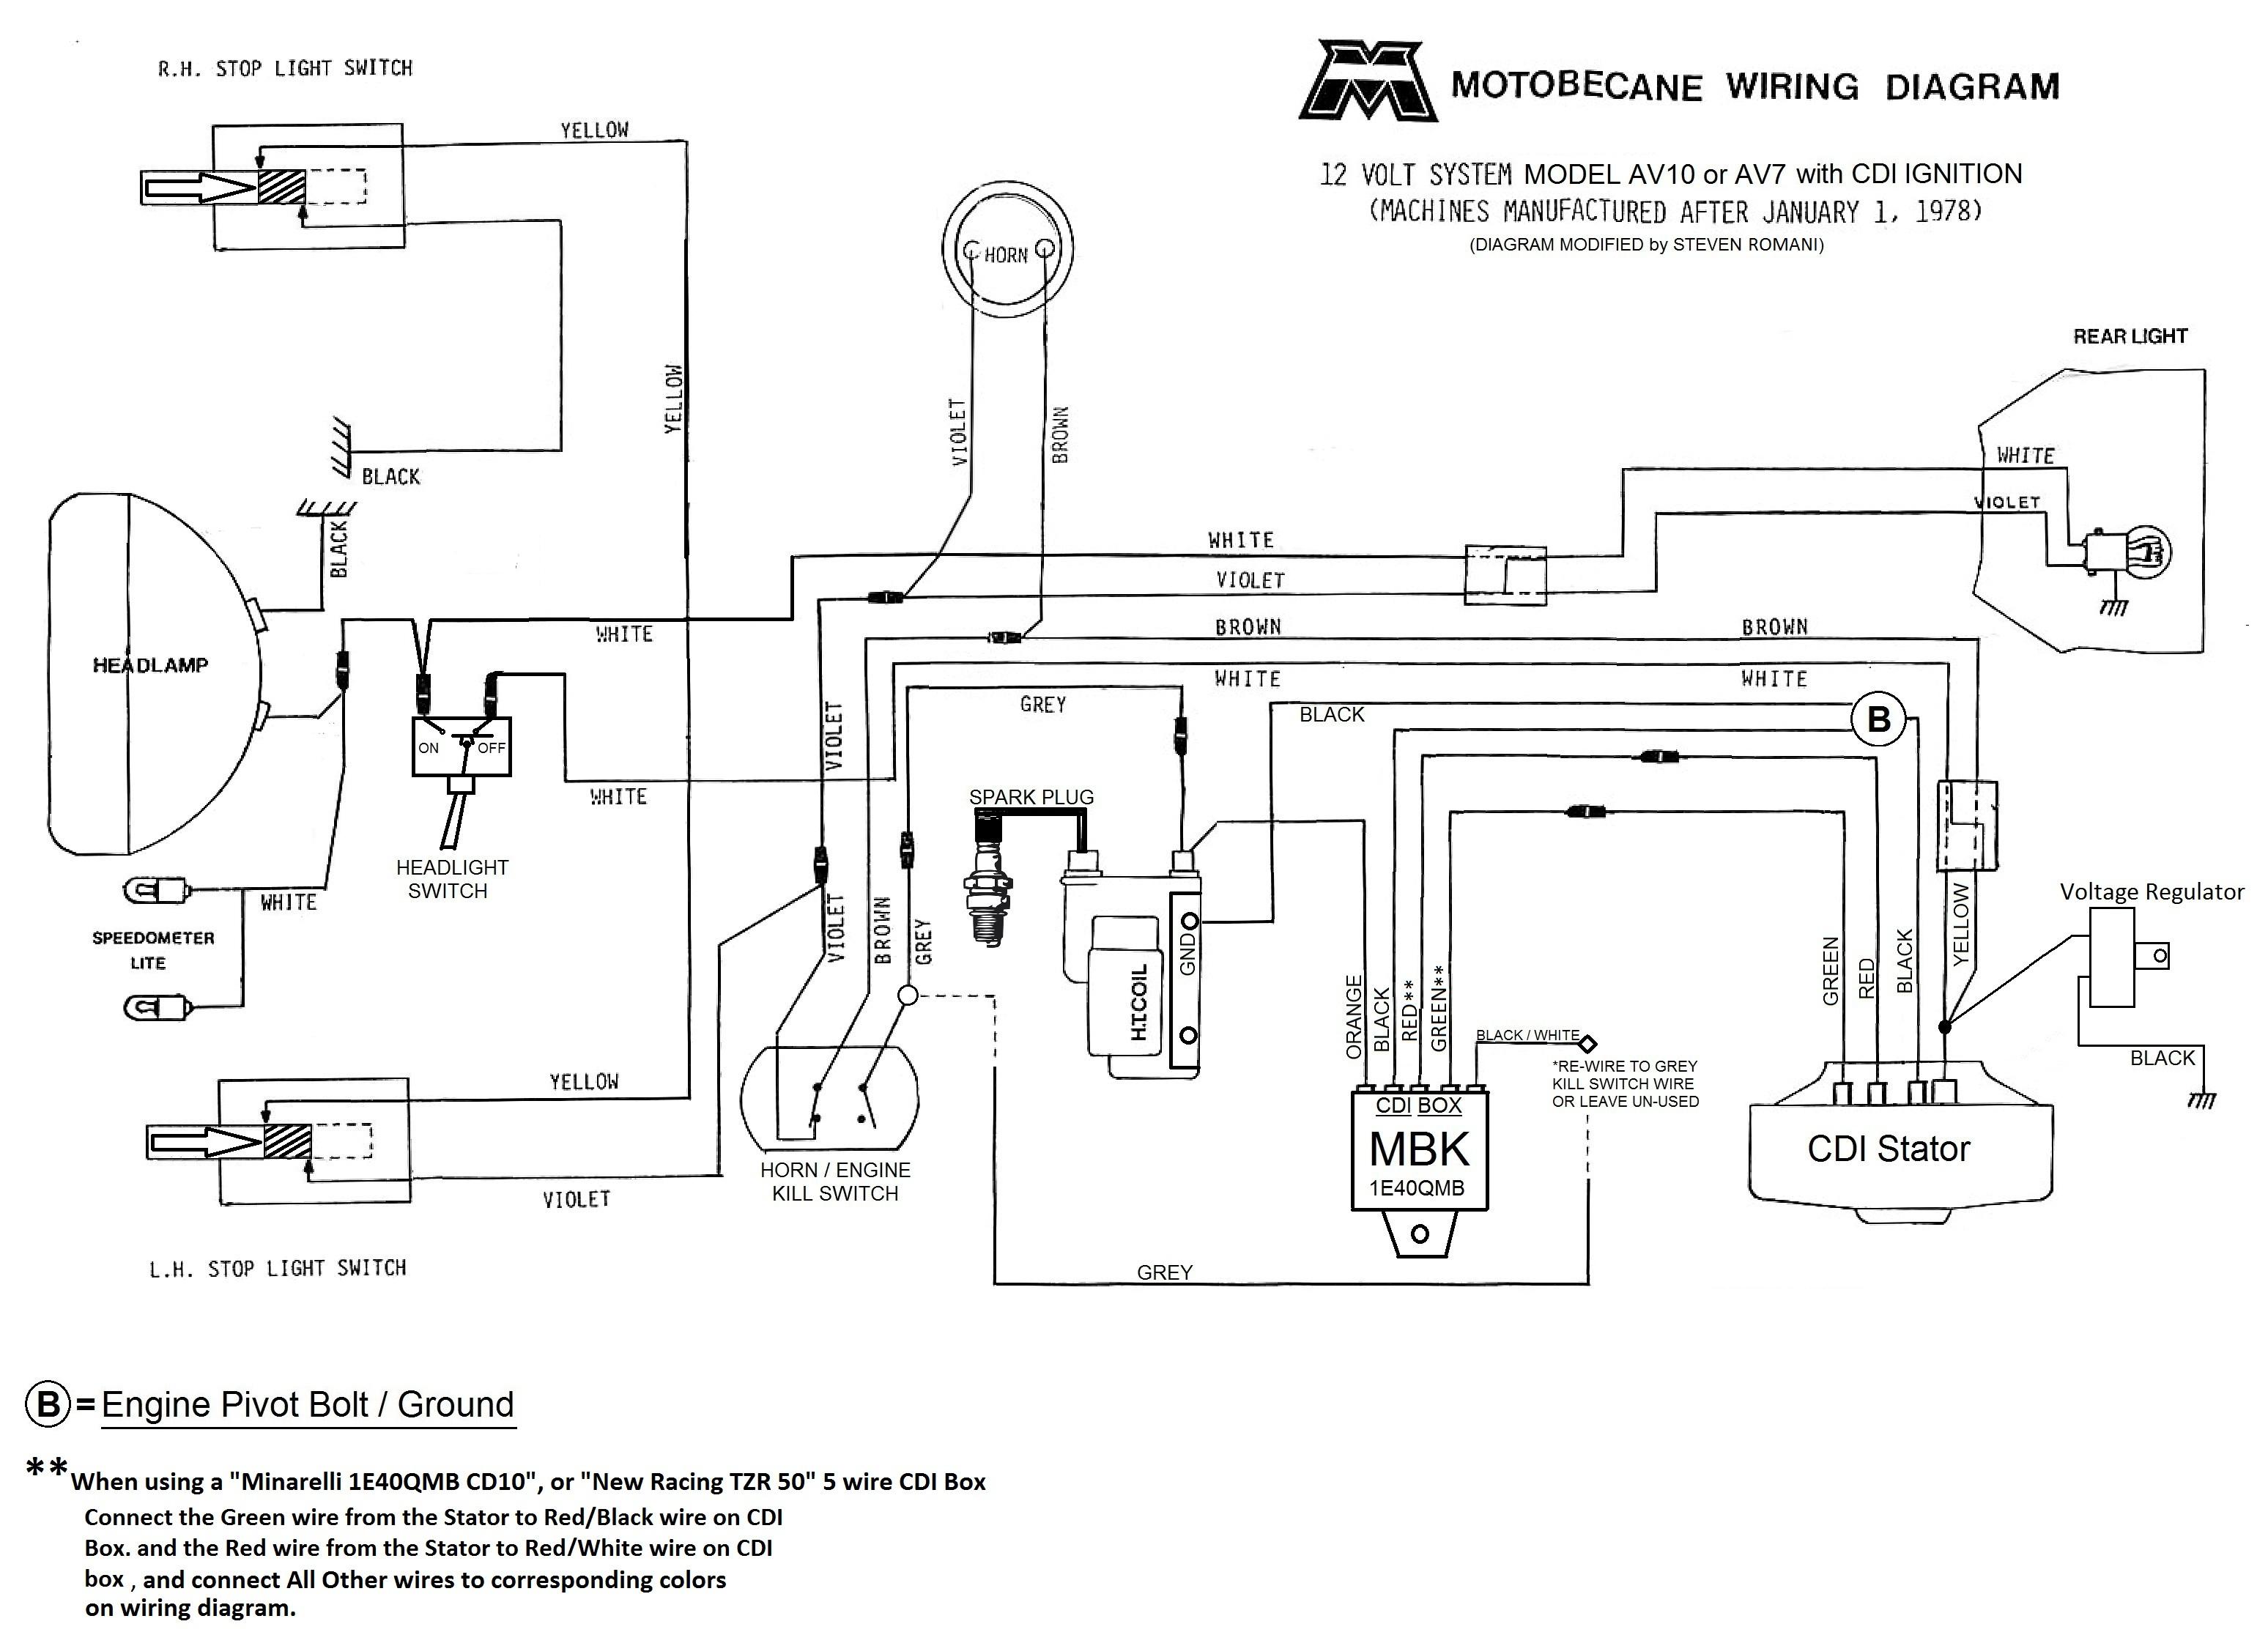 DIAGRAM] Motorcycle Cdi Wiring Diagrams FULL Version HD Quality Wiring  Diagrams - LADDERDIAGRAM.NUITDEBOUTAIX.FRladderdiagram.nuitdeboutaix.fr